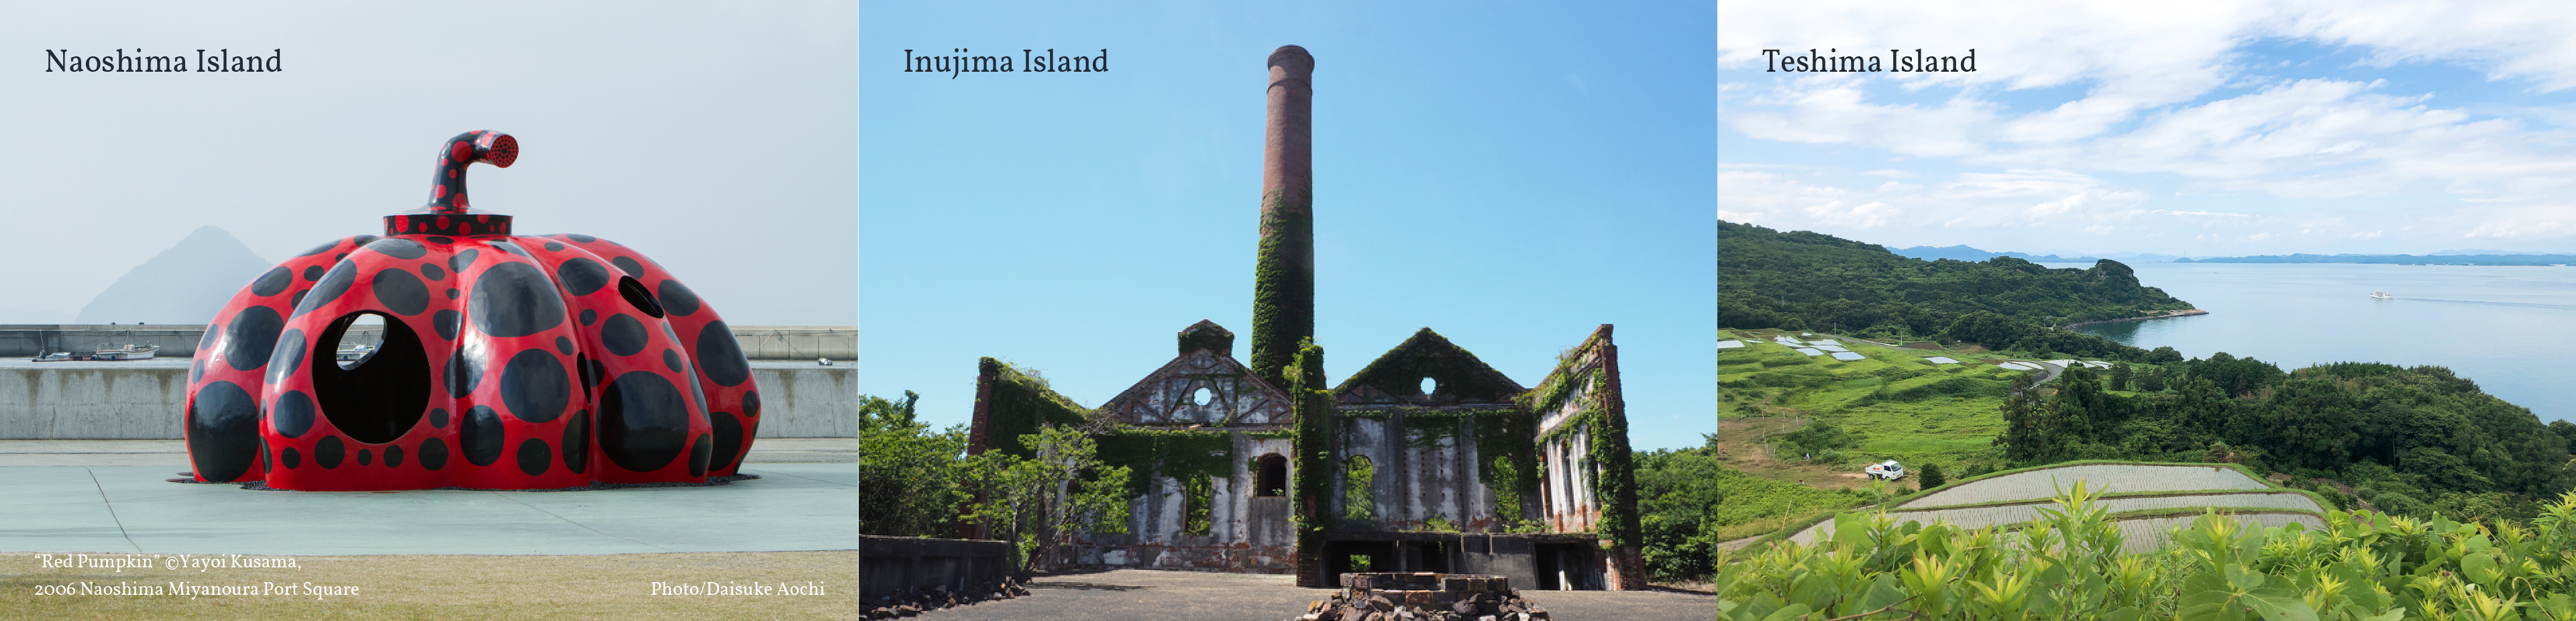 Setouchi Islands